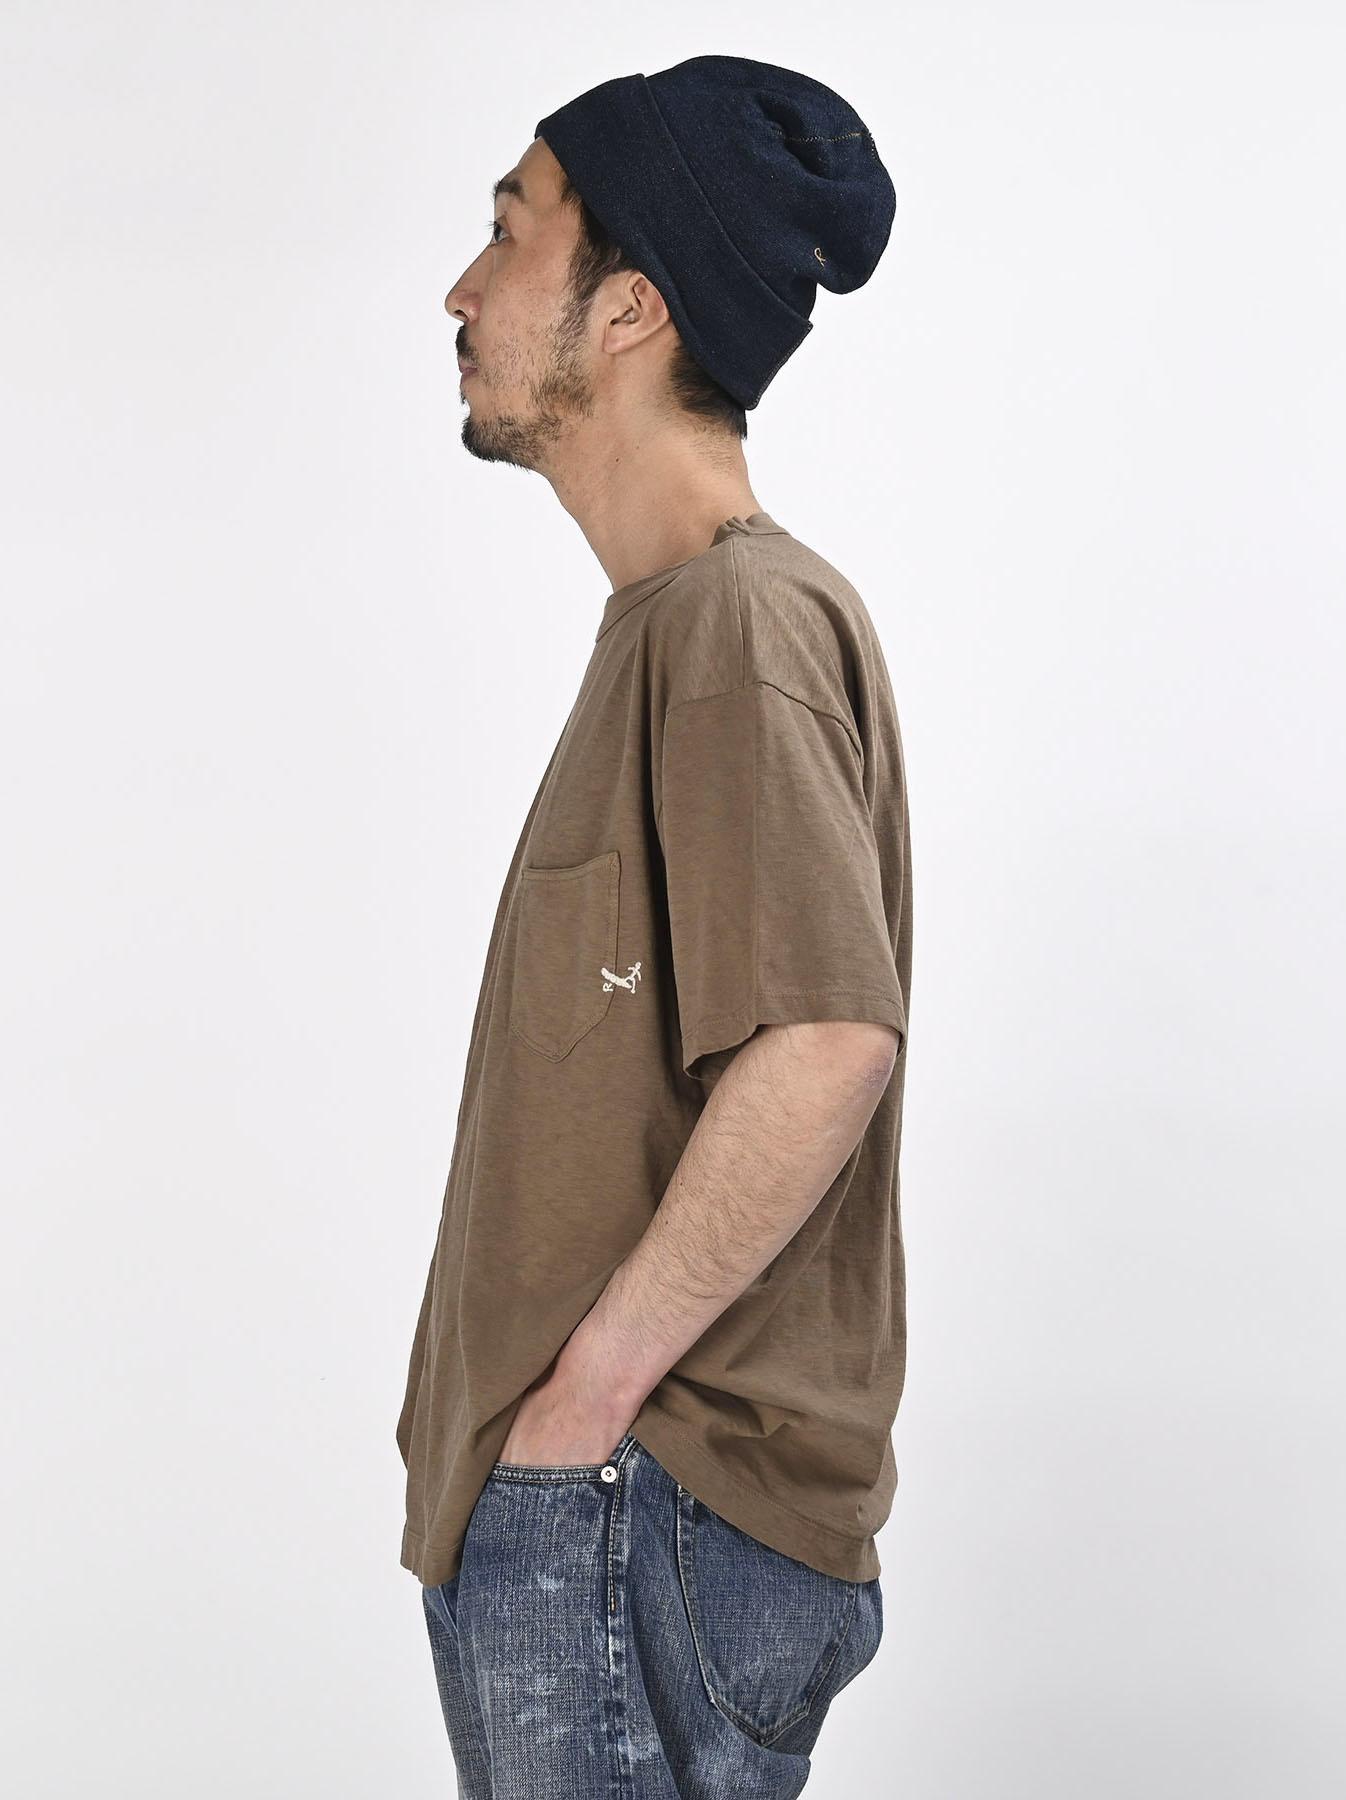 Hayama-kun Embroidered 908 Ocean T-shirt (0621)-4